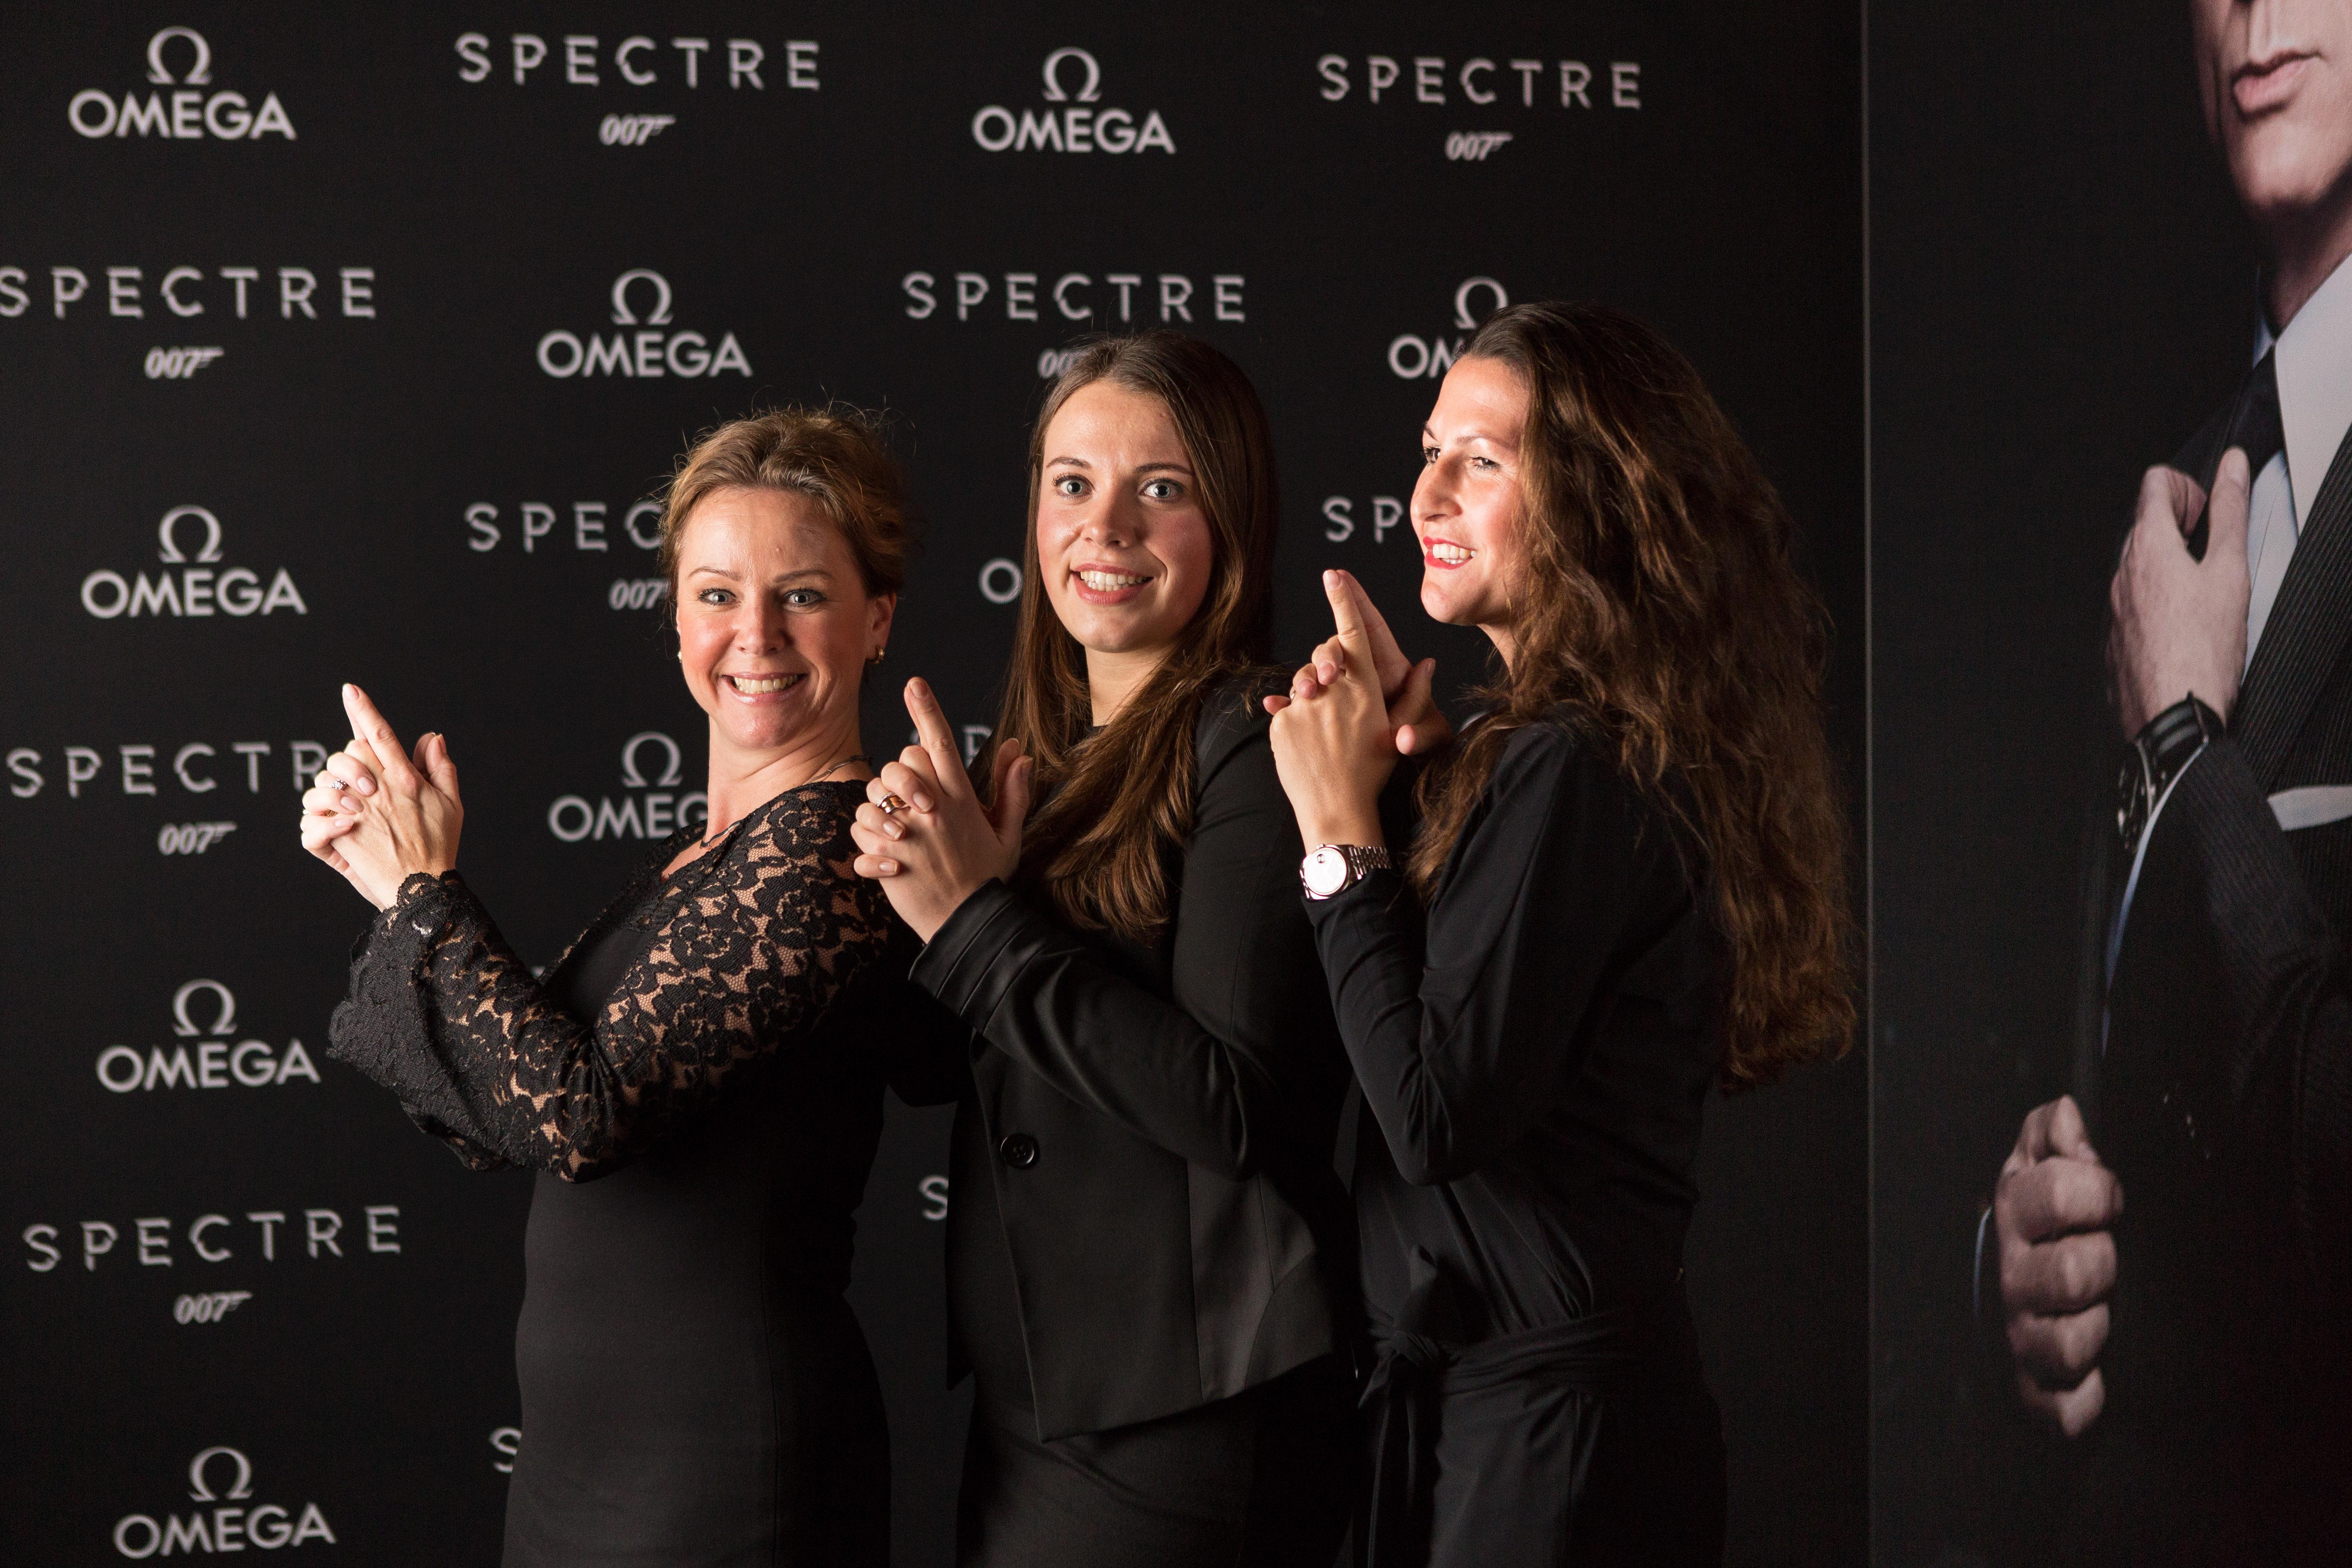 spectre-omega wall-41